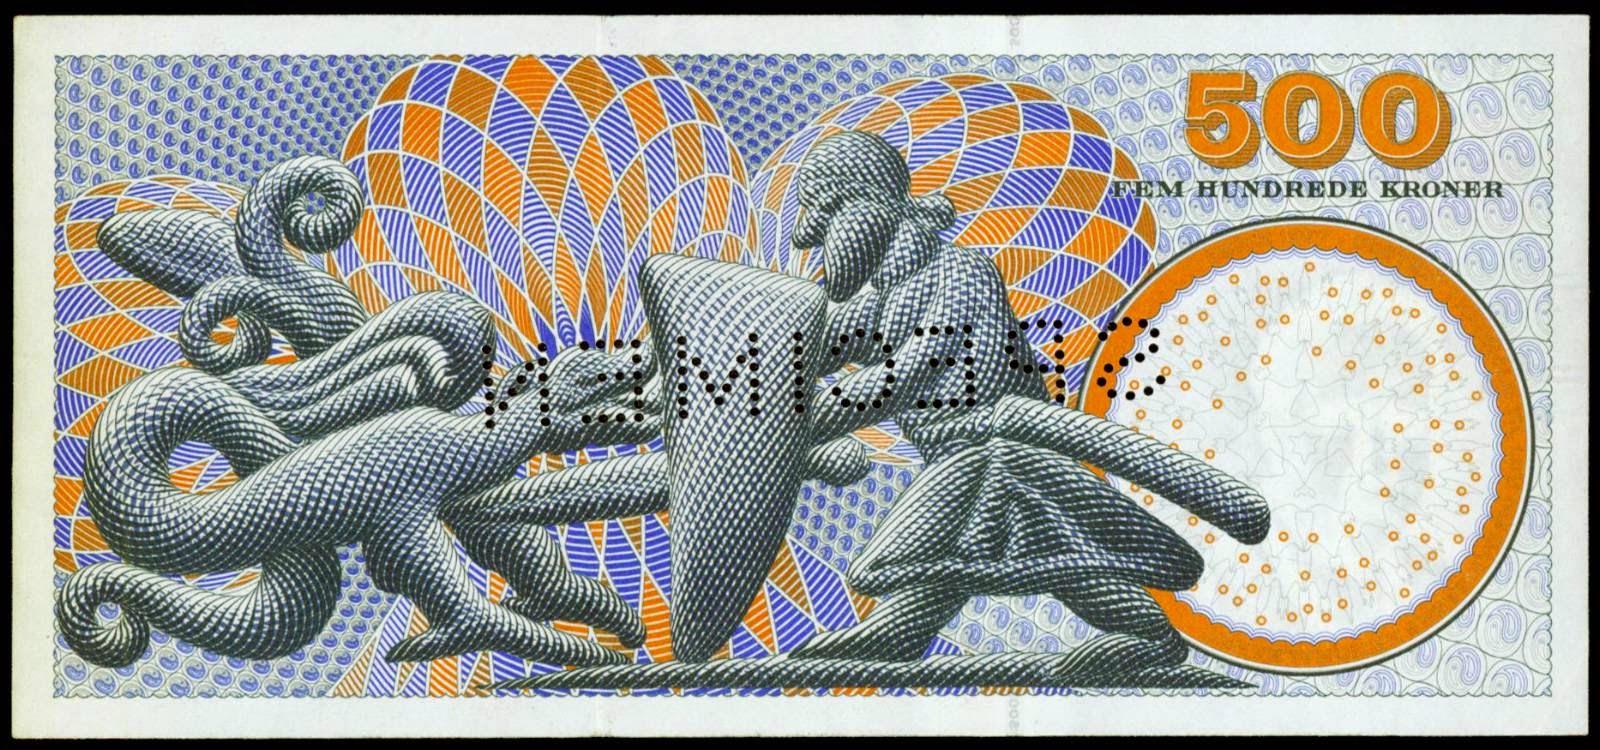 Banknotes of Denmark 500 Kroner